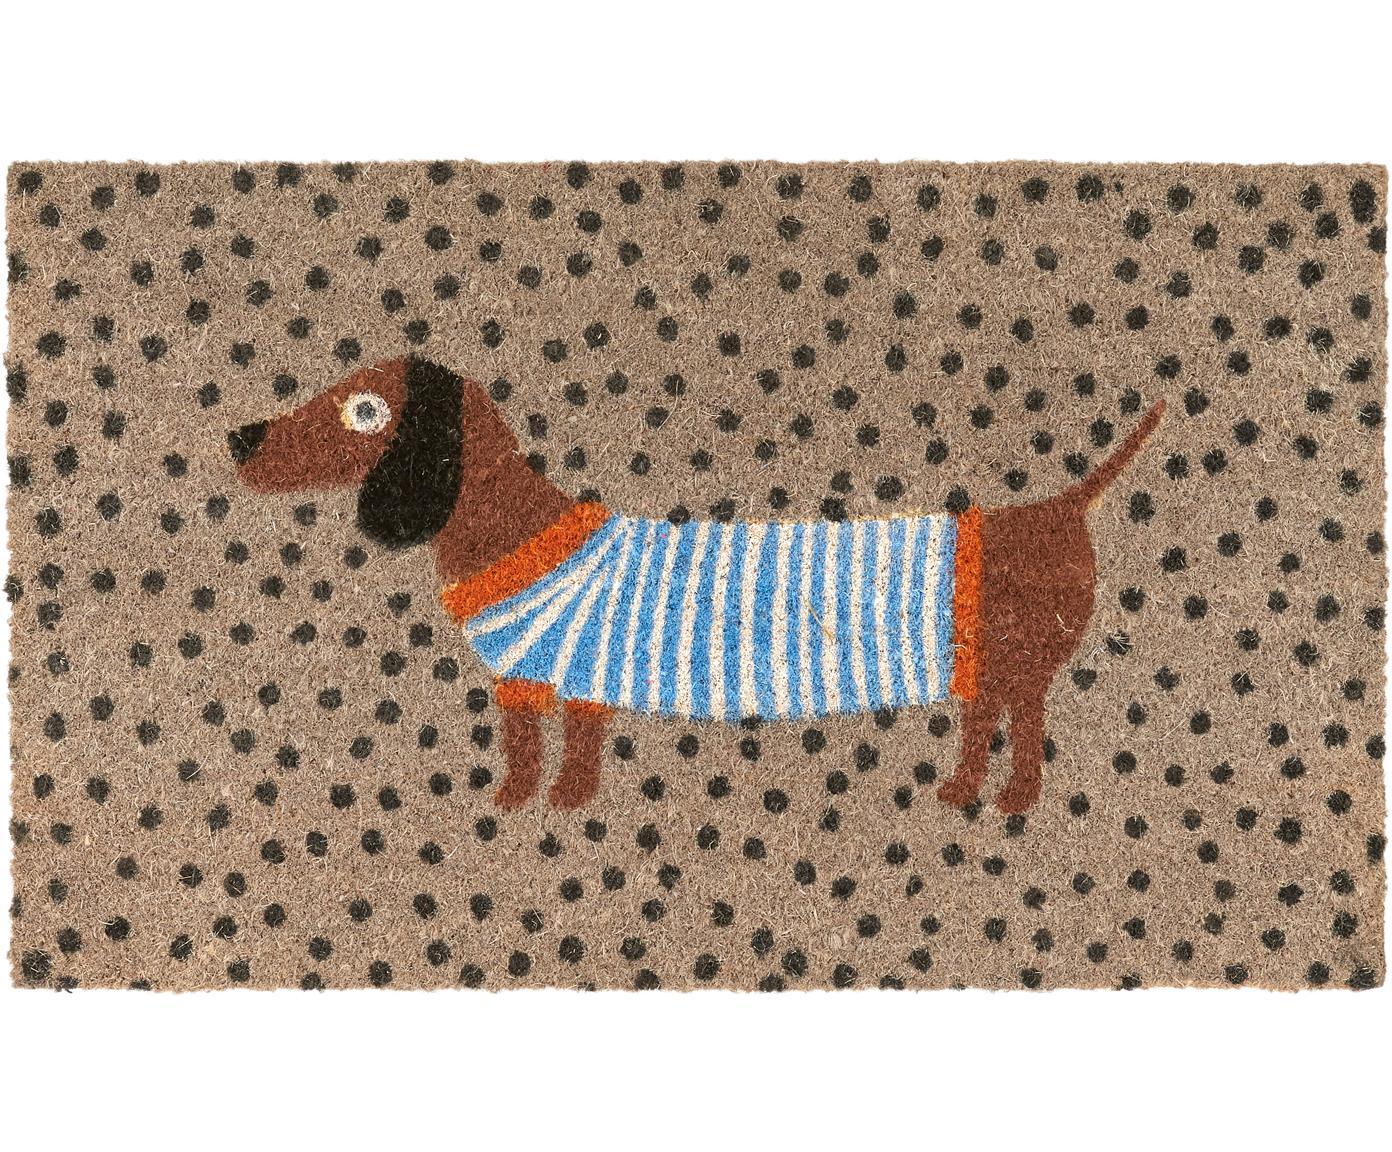 Deurmat Sausage Dog, Onderzijde: PVC, Multicolour, 45 x 75 cm